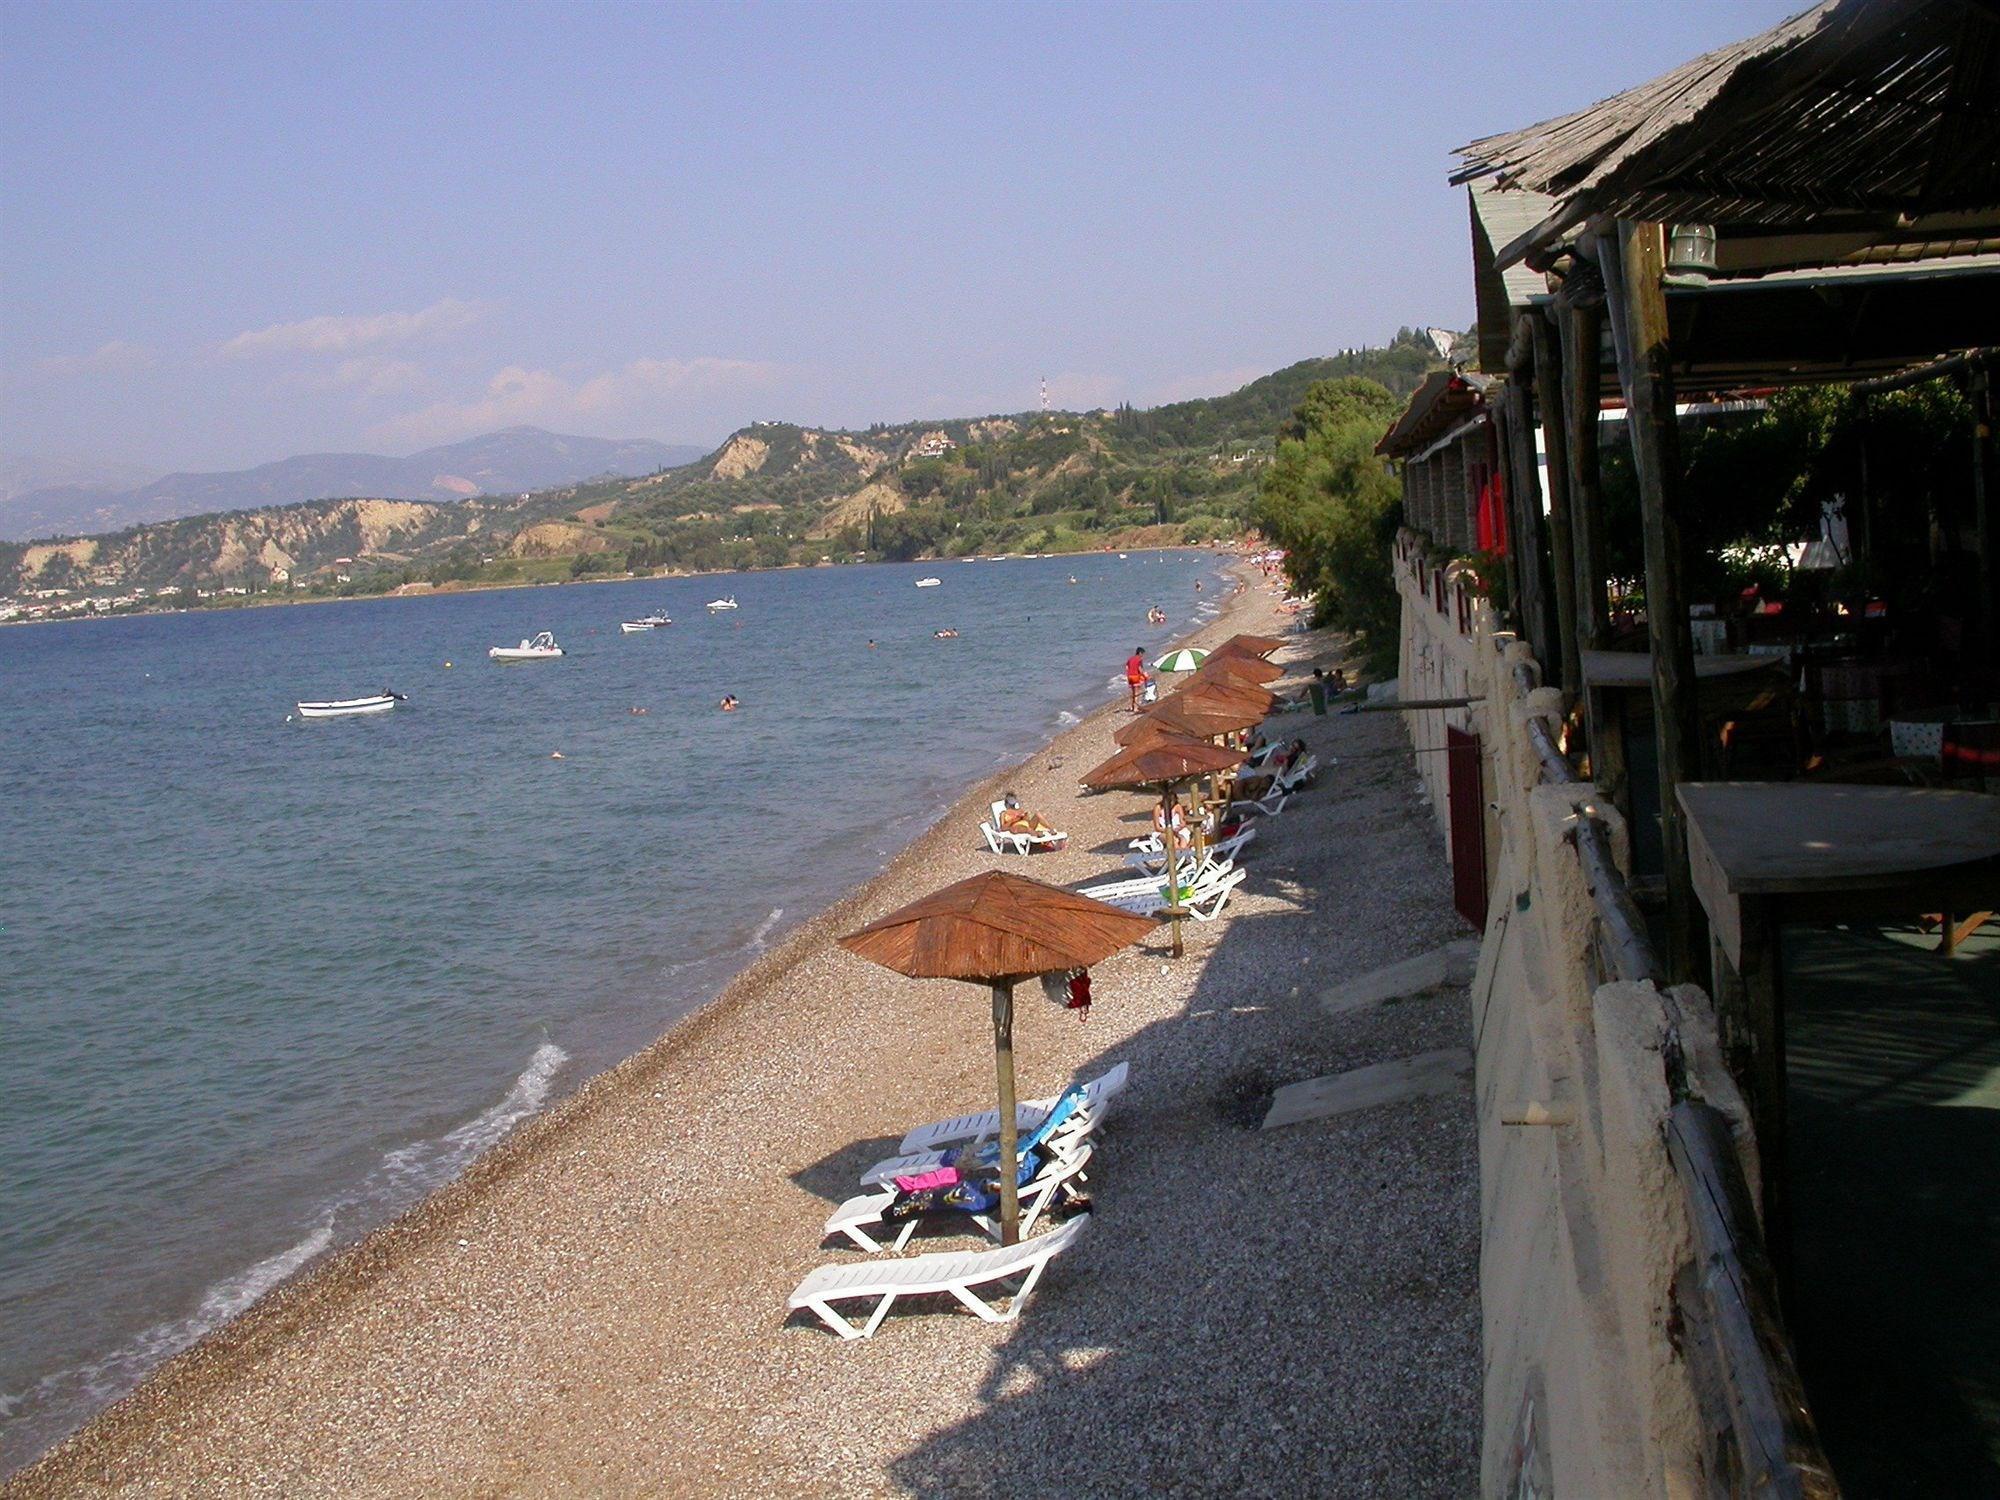 Castella Beach Skyscanner Hotels